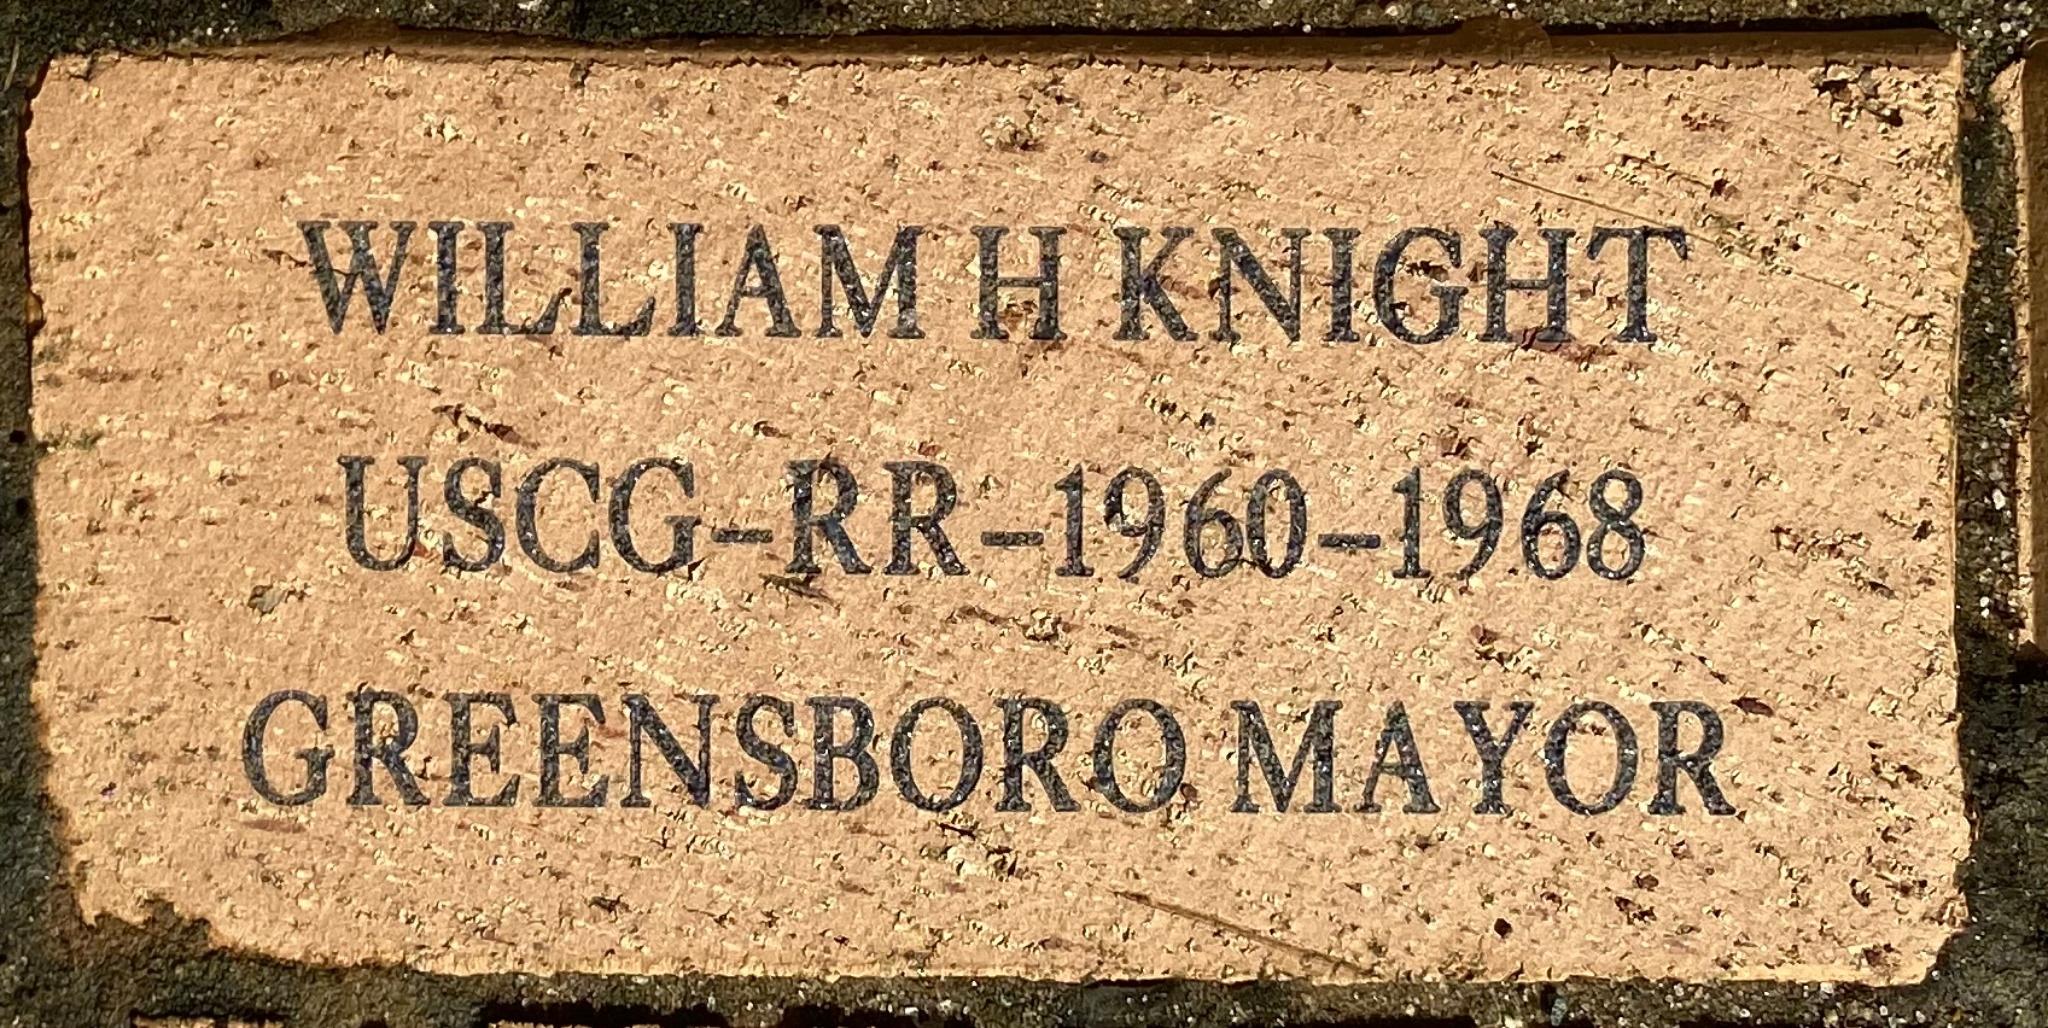 WILLIAM H KNIGHT USCG-RR-1960-1968 GREENSBORO MAYOR